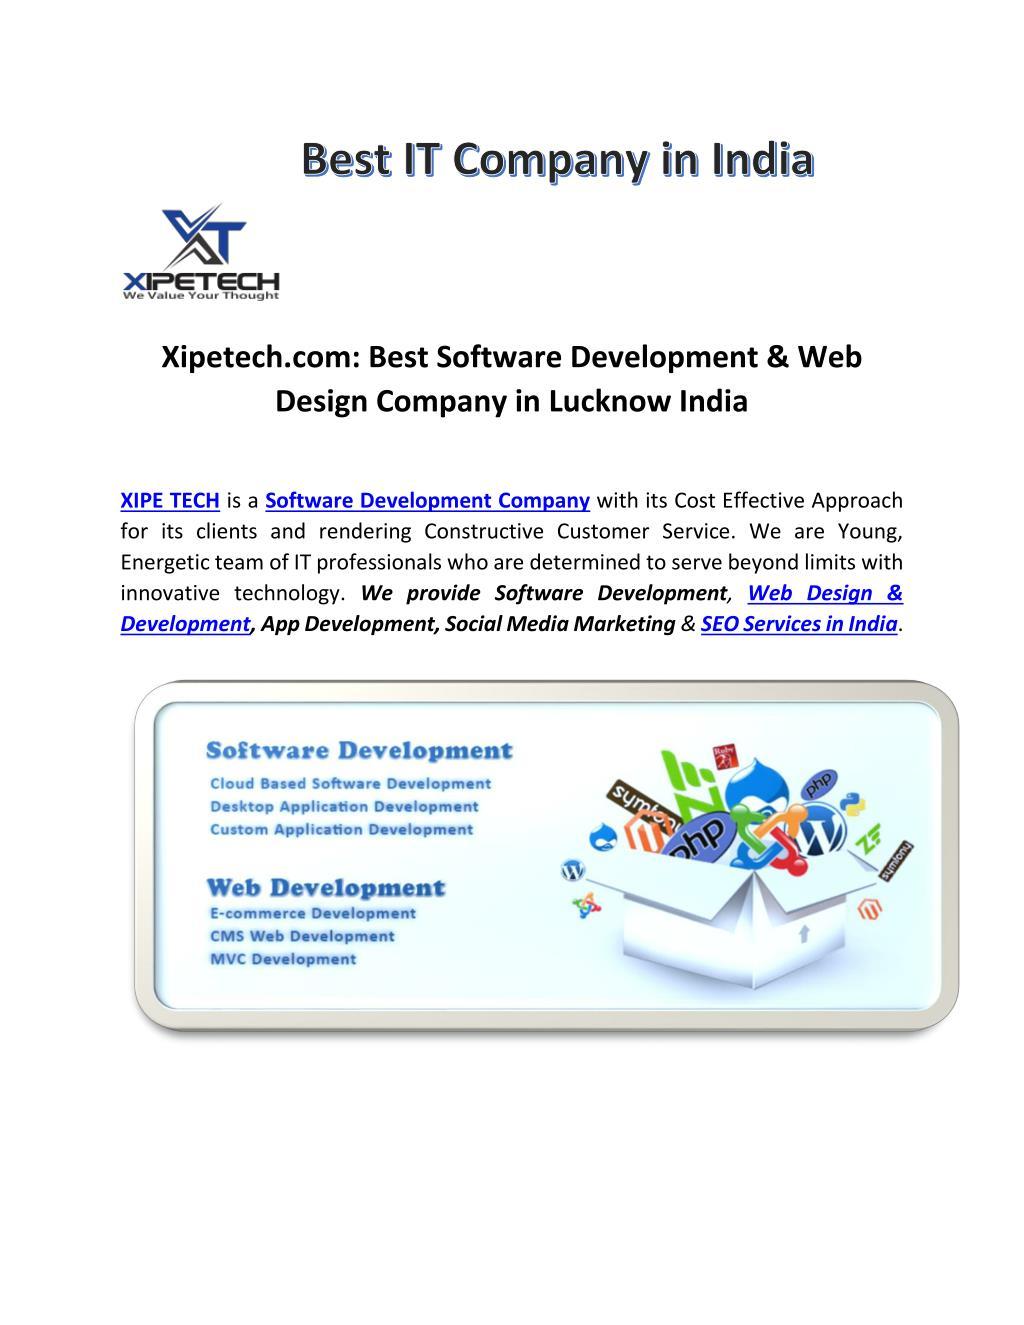 Ppt Xipetech Software Development Web Design Seo Company Lko Powerpoint Presentation Id 7329921